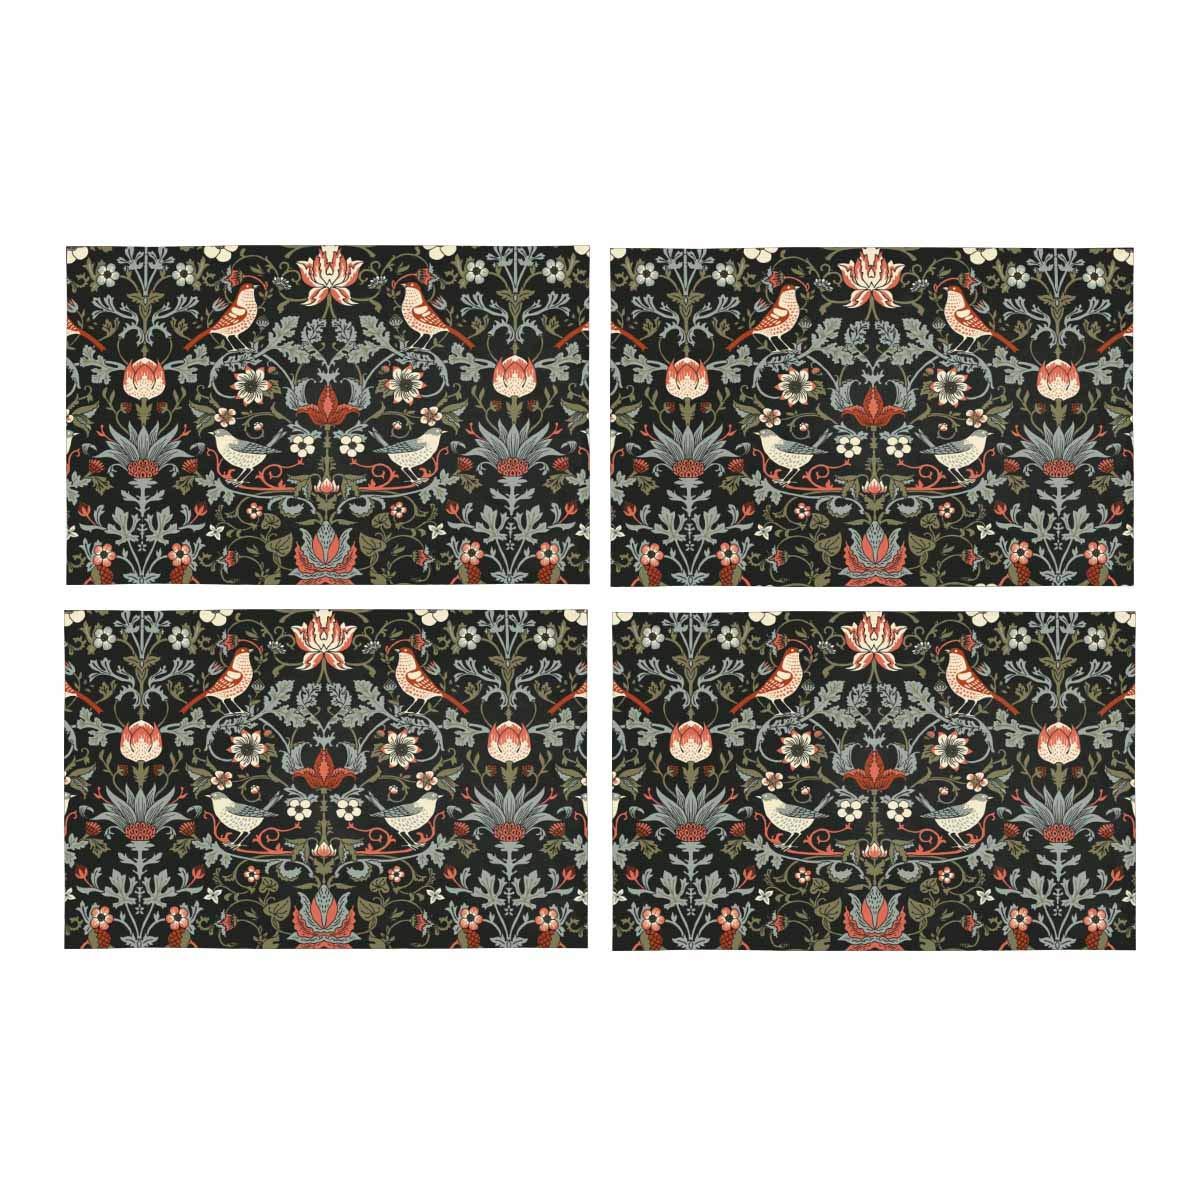 InterestPrint 美しいハチドリ 赤の花 洗濯可能 ポリエステル生地 プレースマット プレートマットホルダー 4枚セット 耐熱性 テーブルマット プロテクター 12 x 18インチ Set of 4 YIBN-PD0105-S4-08 Set of 4 デザイン#8 B07J55MR9R